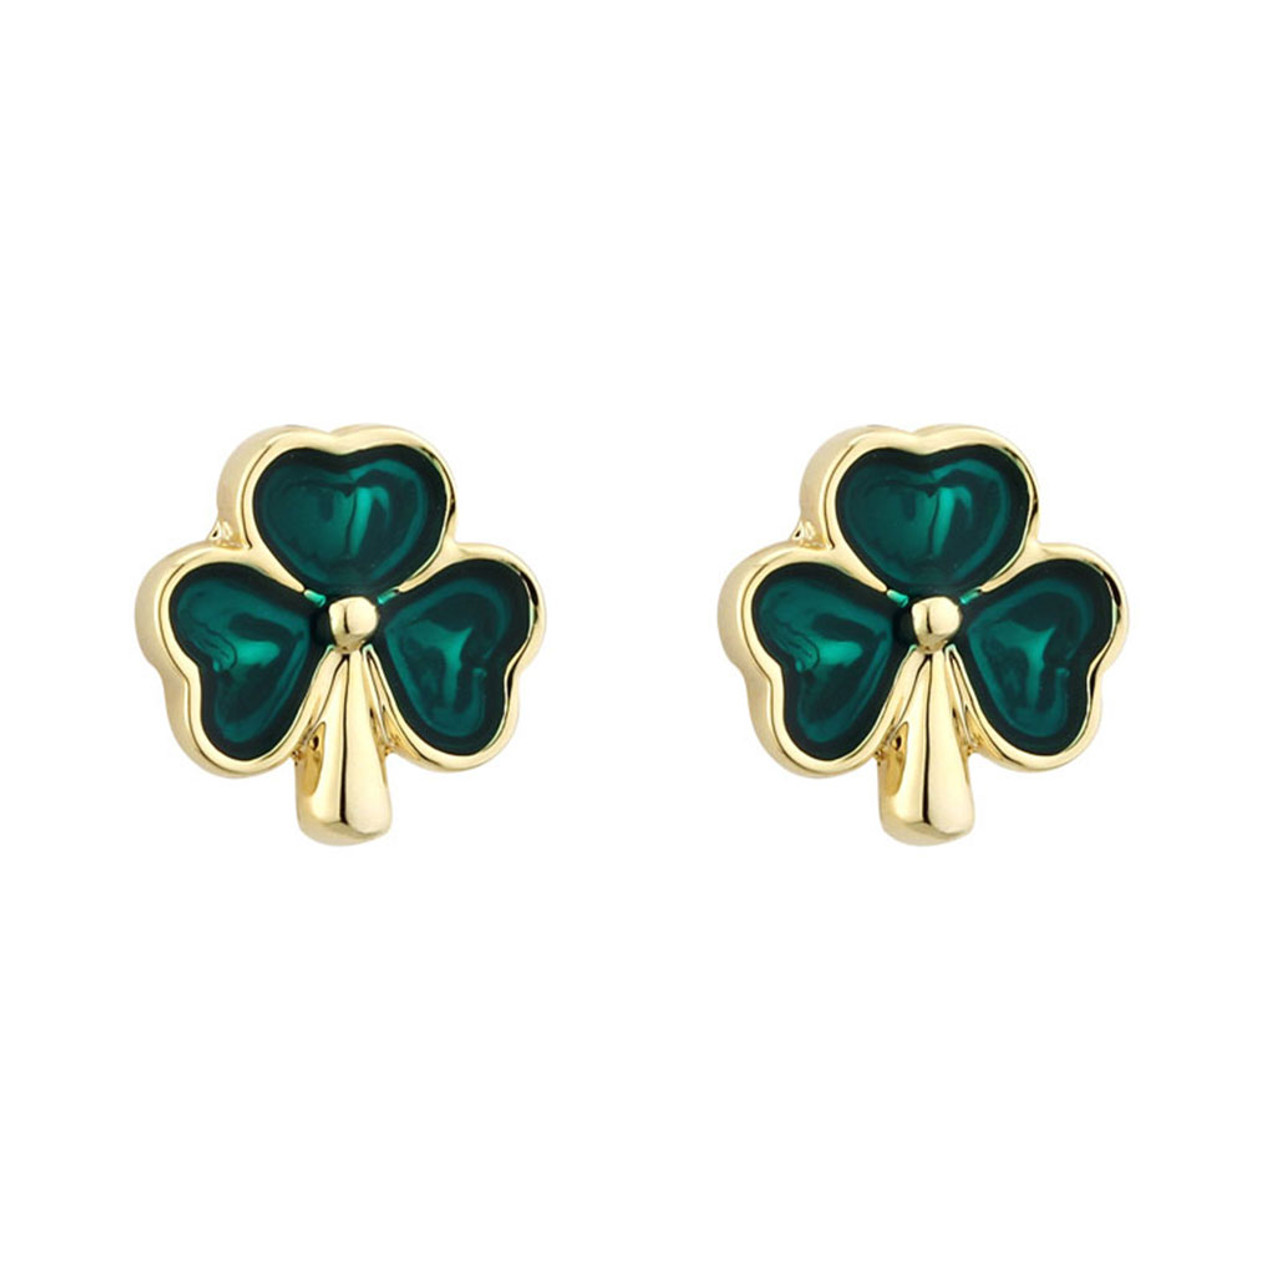 18 kt Gold Plated Shamrock Stud Earrings